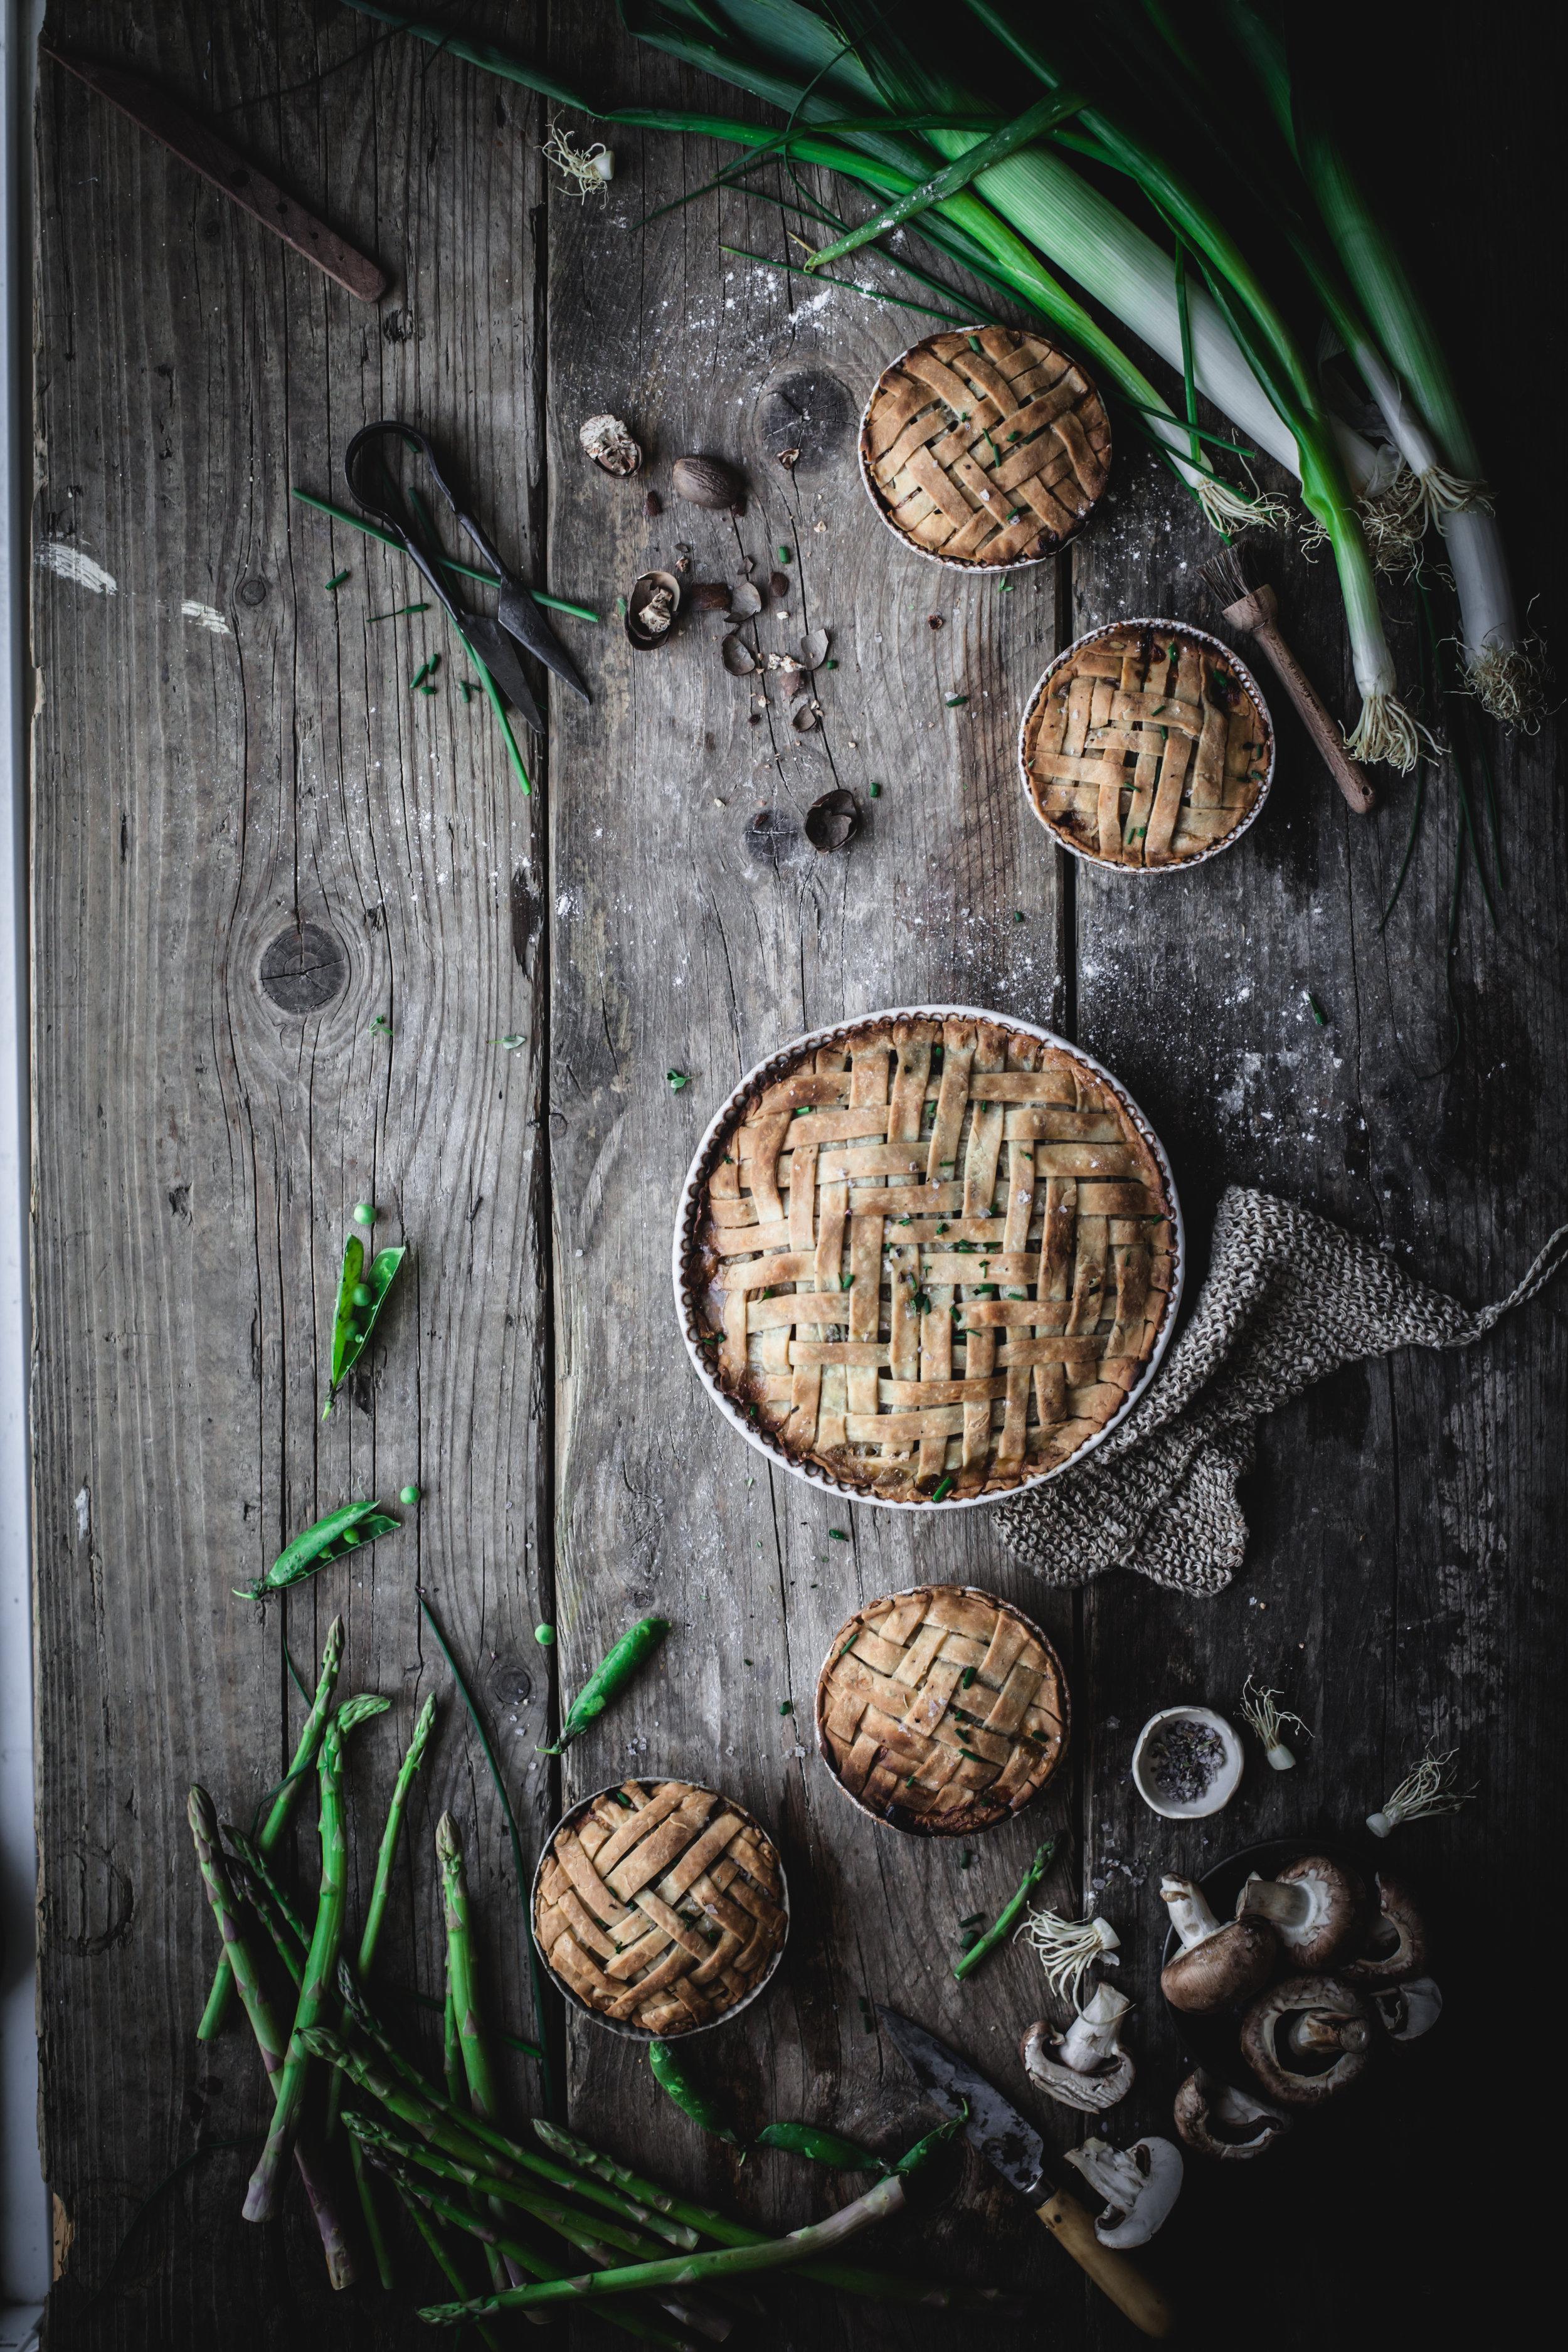 vegan vegetable pies with herbs pastry